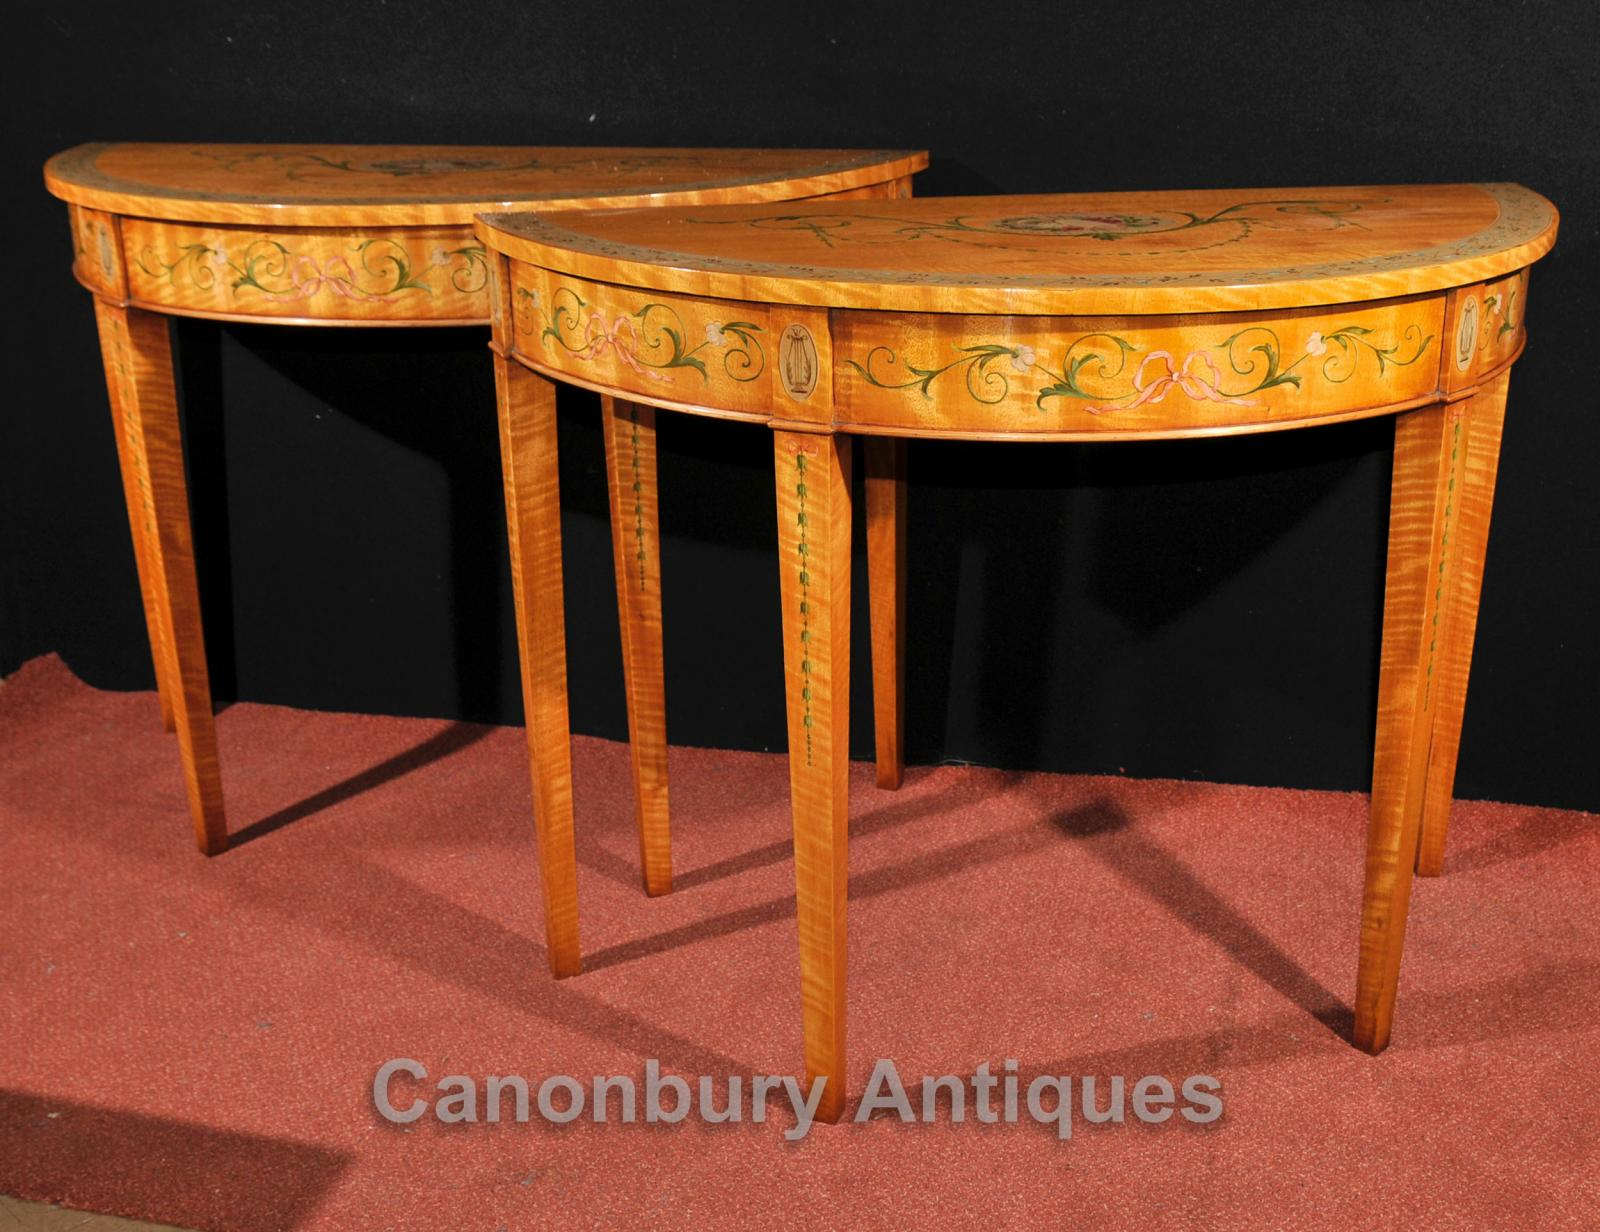 pair adams console tables regency demi lune painted satinwood furniture ebay. Black Bedroom Furniture Sets. Home Design Ideas